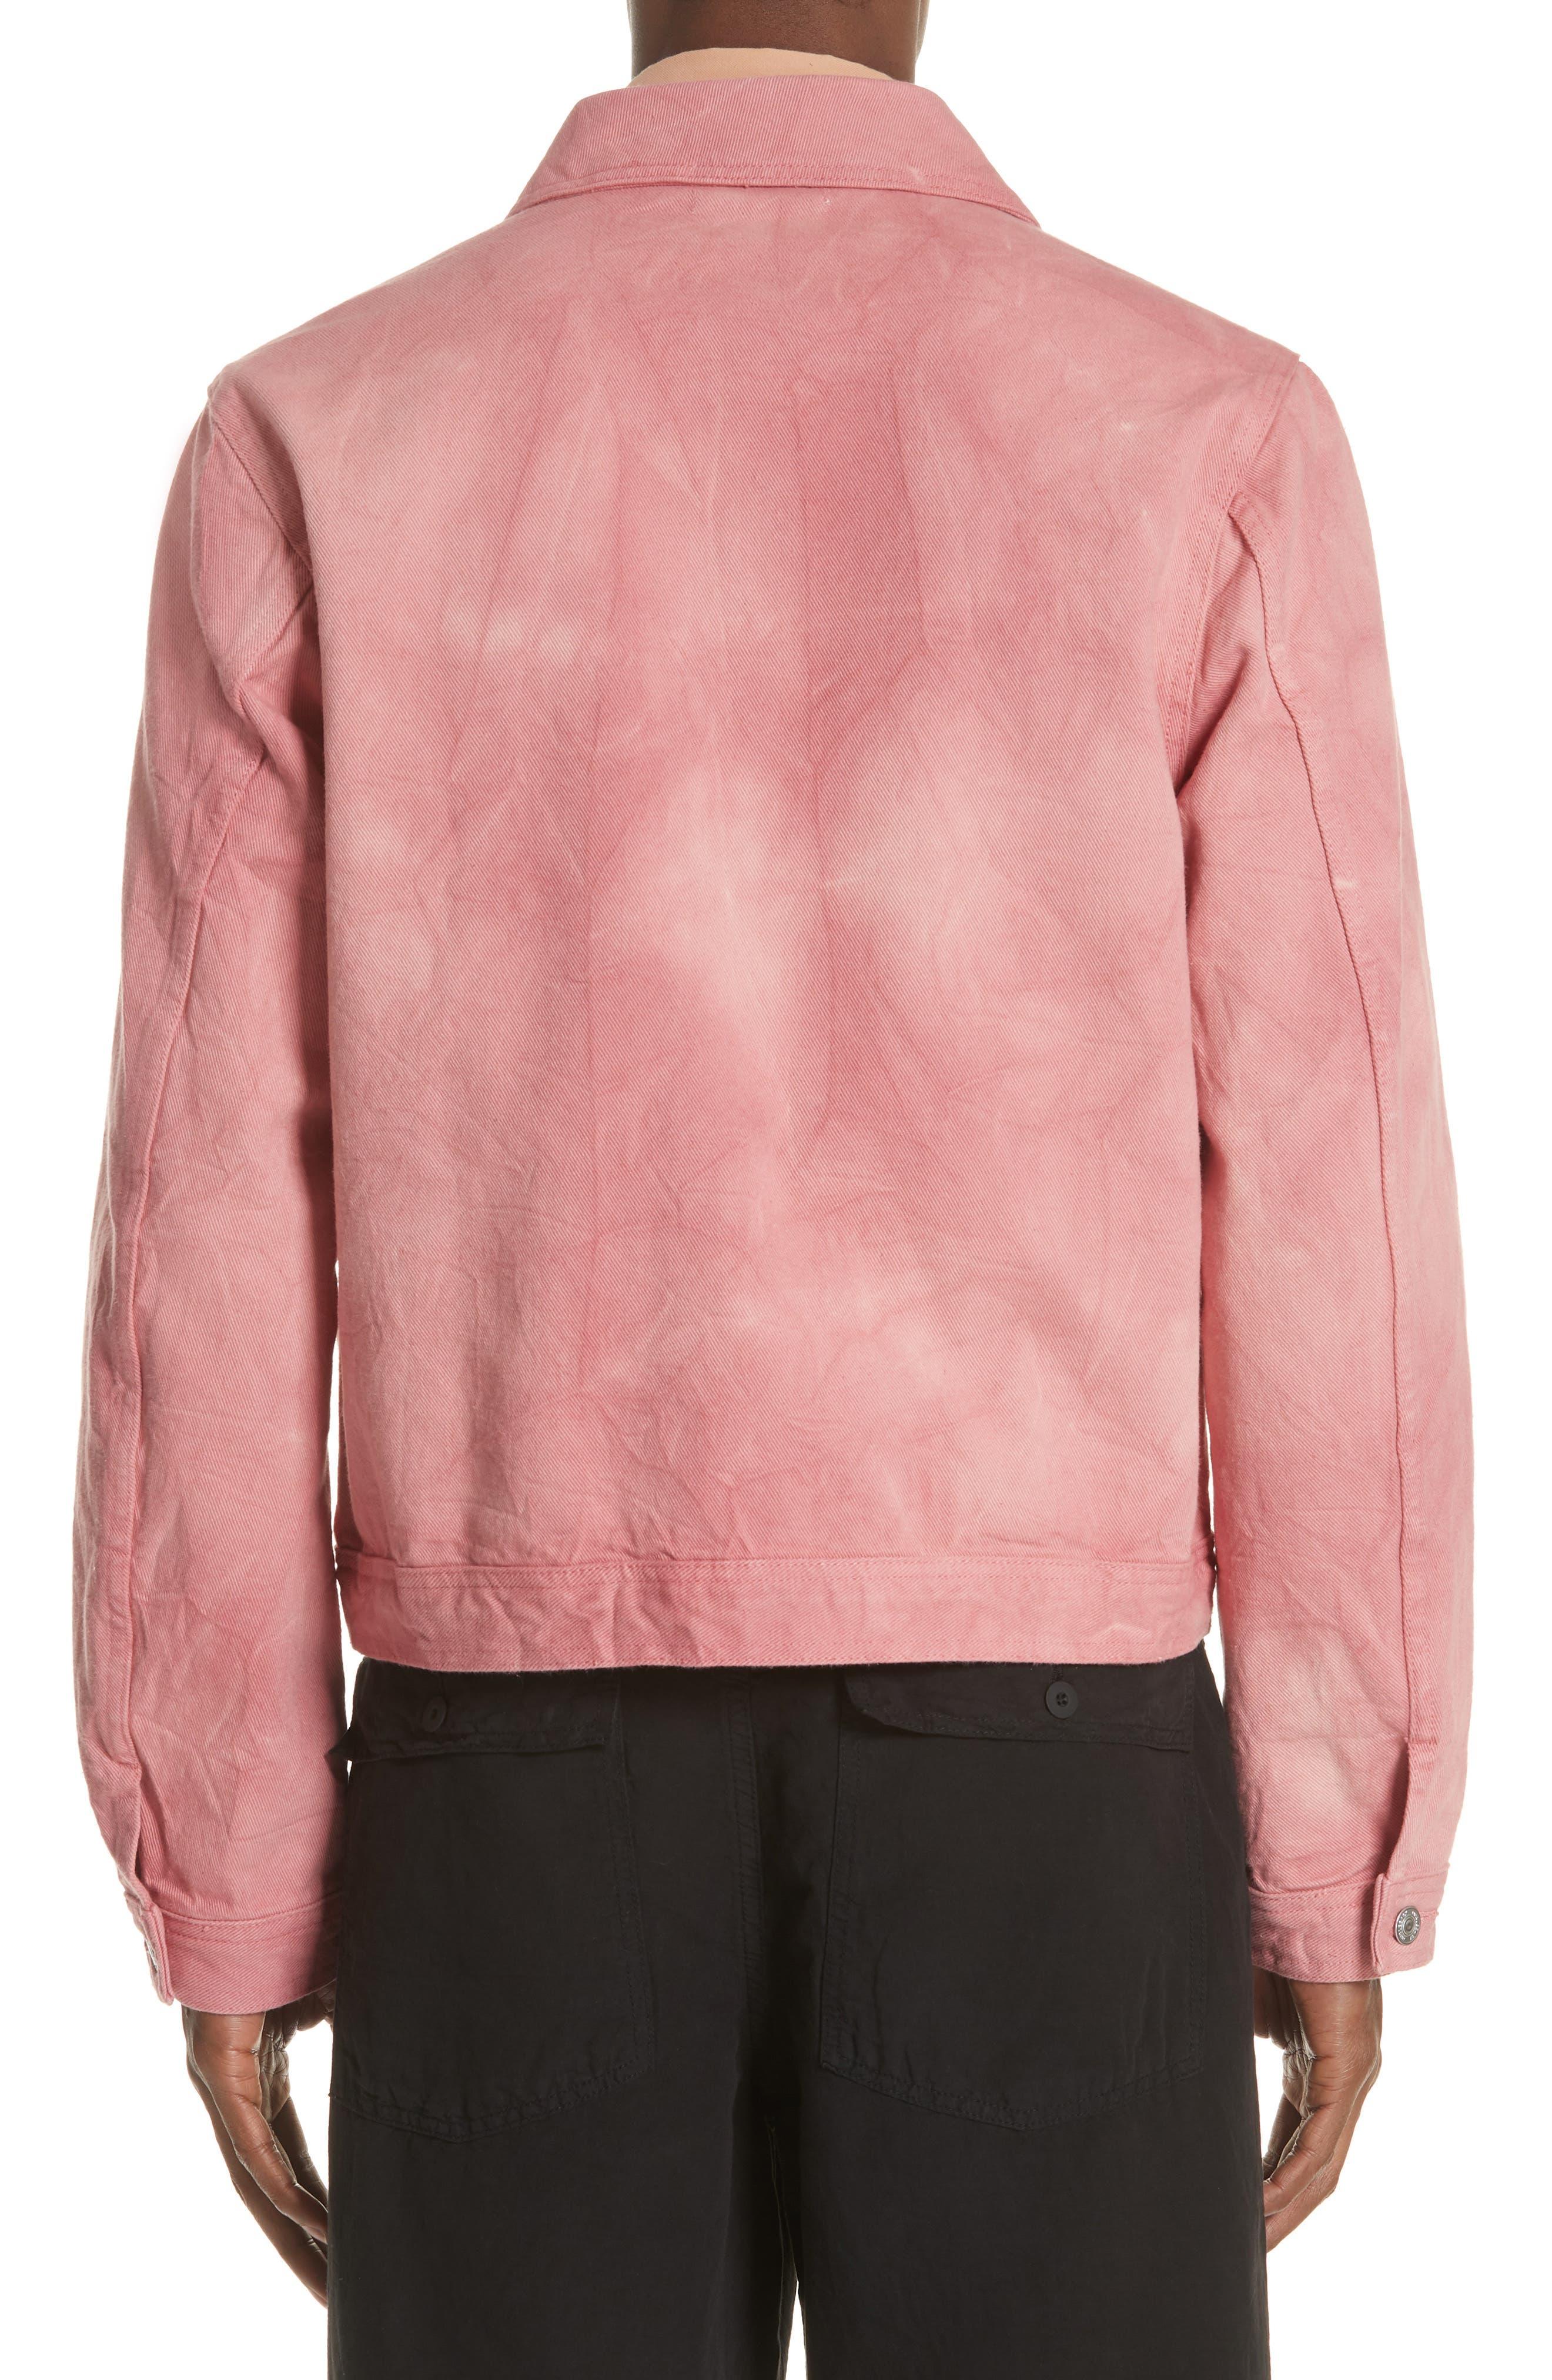 Dye Jacket,                             Alternate thumbnail 2, color,                             Pink